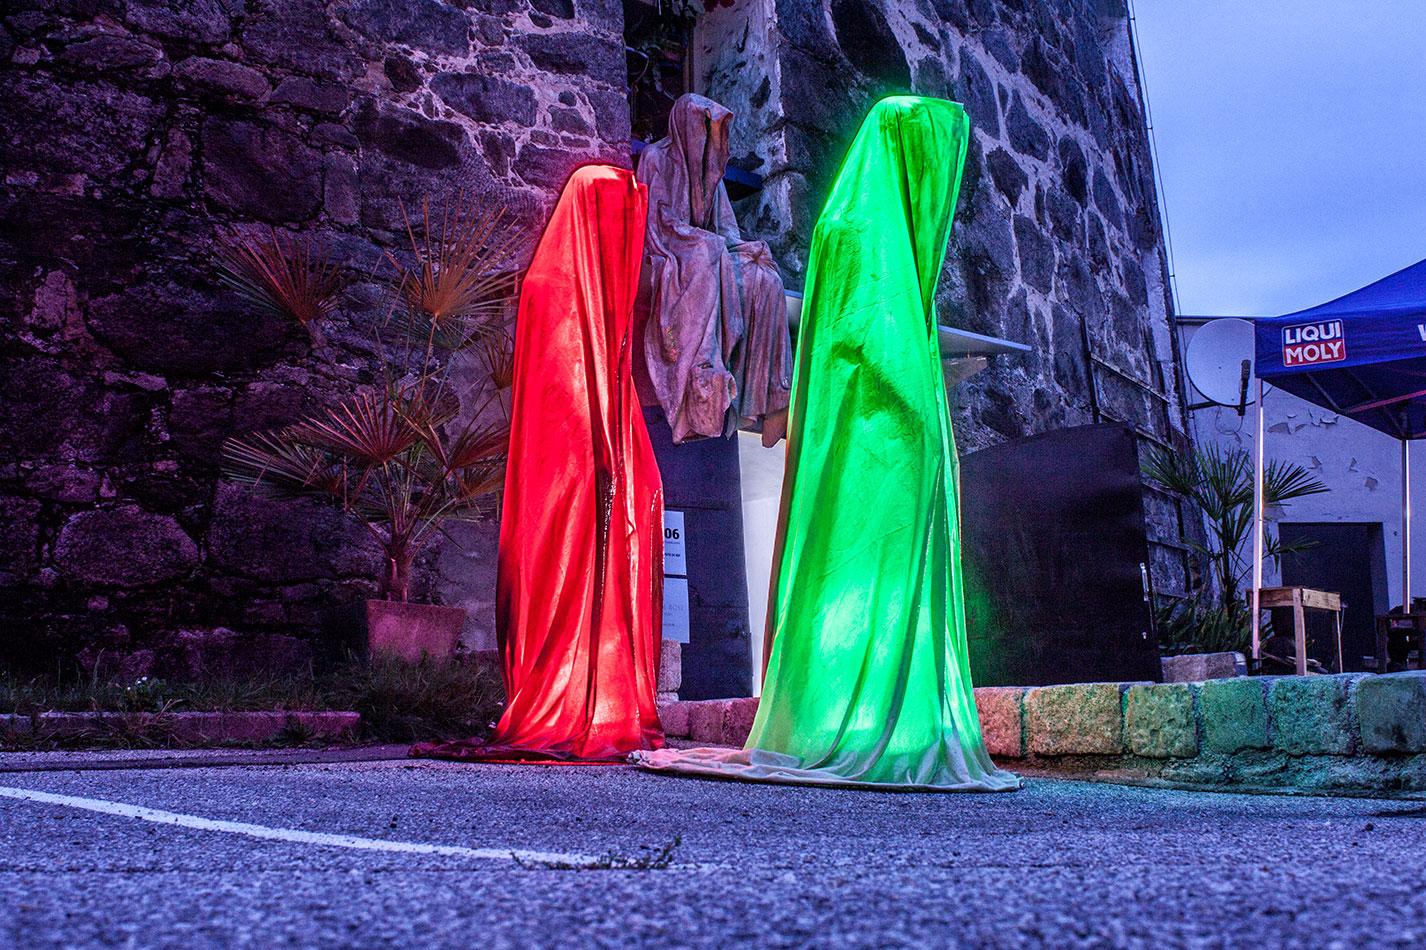 mobile-galerie-gall-toko06-linz-25er-turm-guardians-of-time-manfred-kielnhofer-contemporary-fine-art-design-sculpture-2644